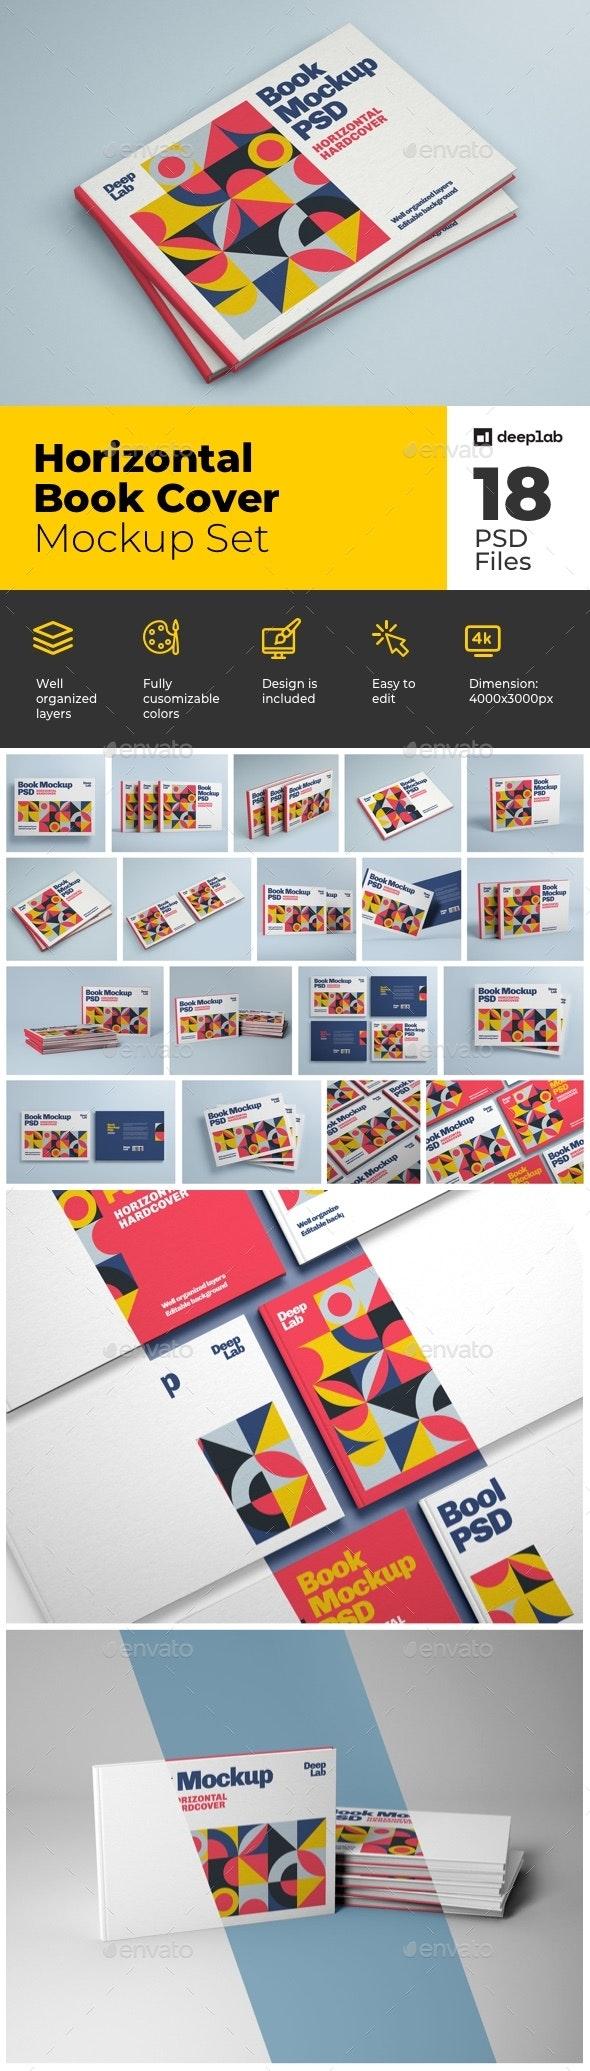 Horizontal Book Cover Mockup Set - Product Mock-Ups Graphics